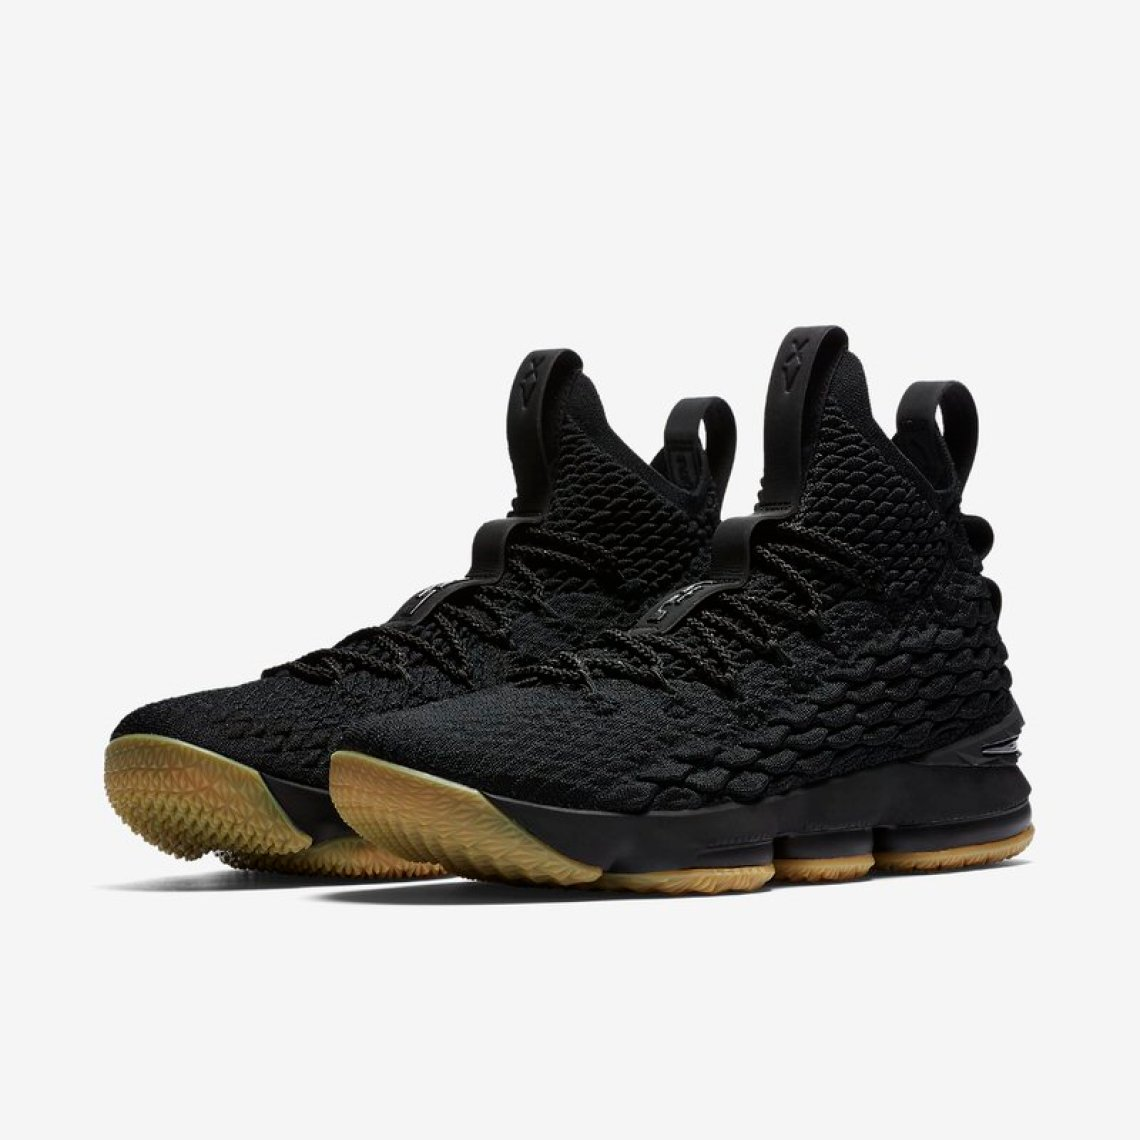 pretty nice f7189 1c44d Nike LeBron 15 Black/Gum // Release Date | Nice Kicks